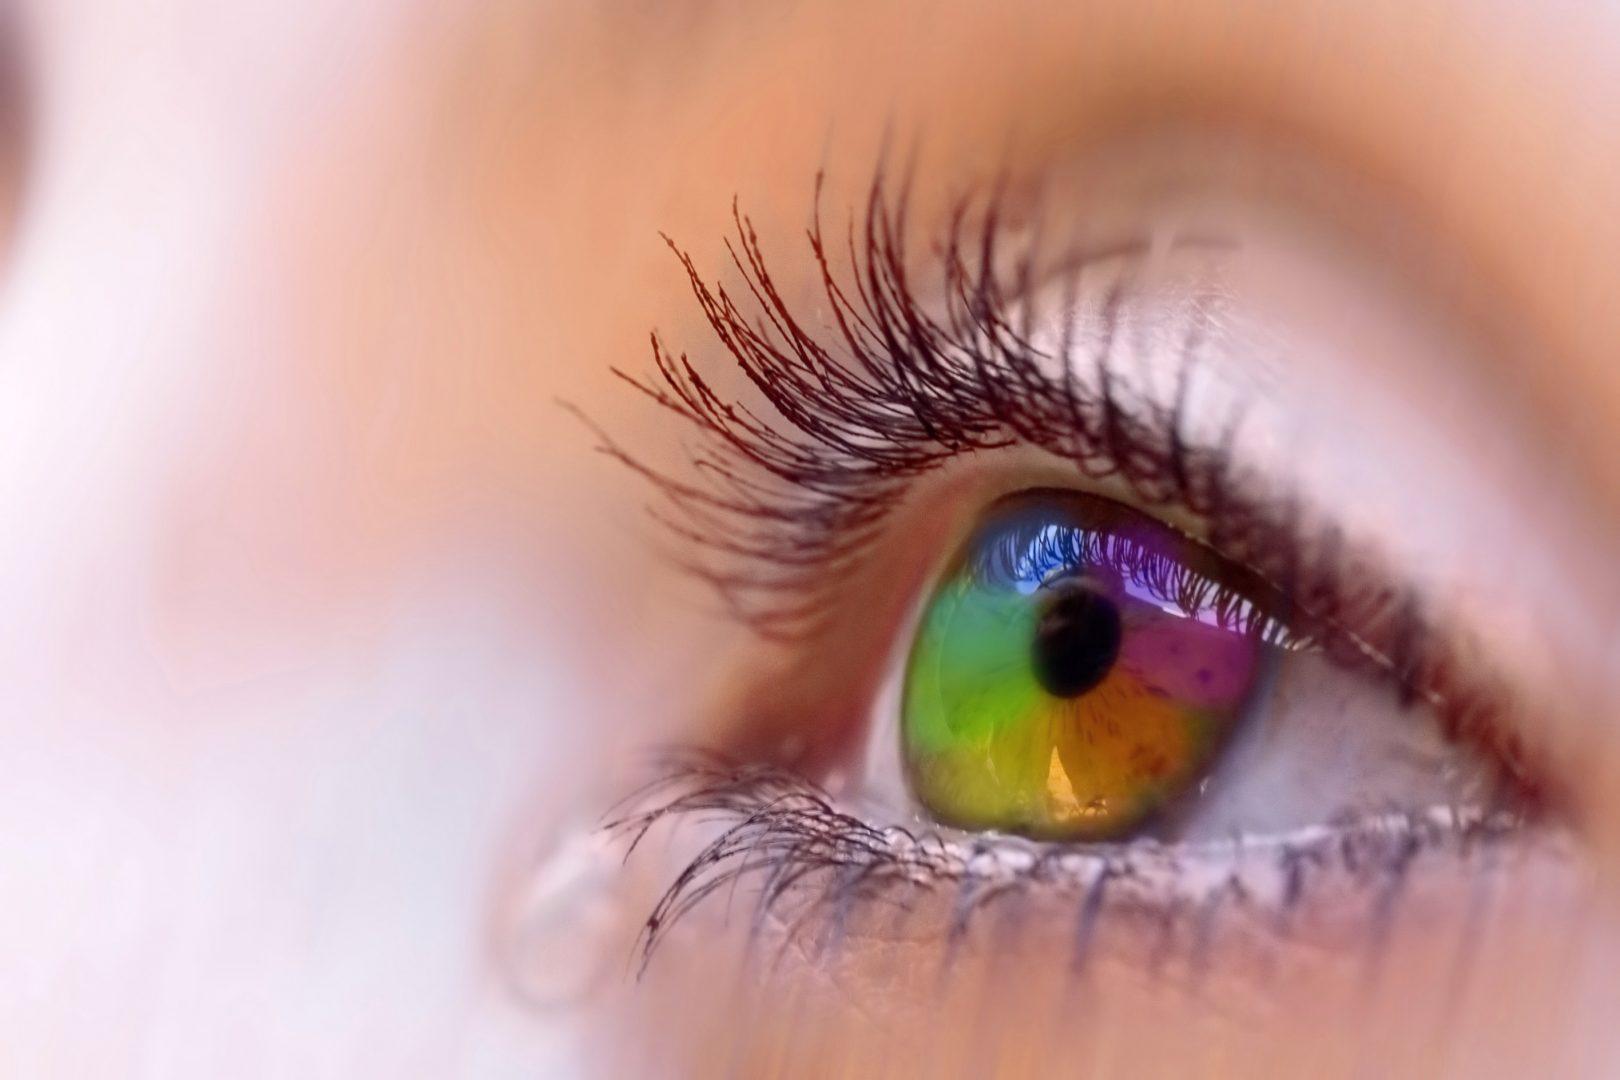 closeup of open eye staring